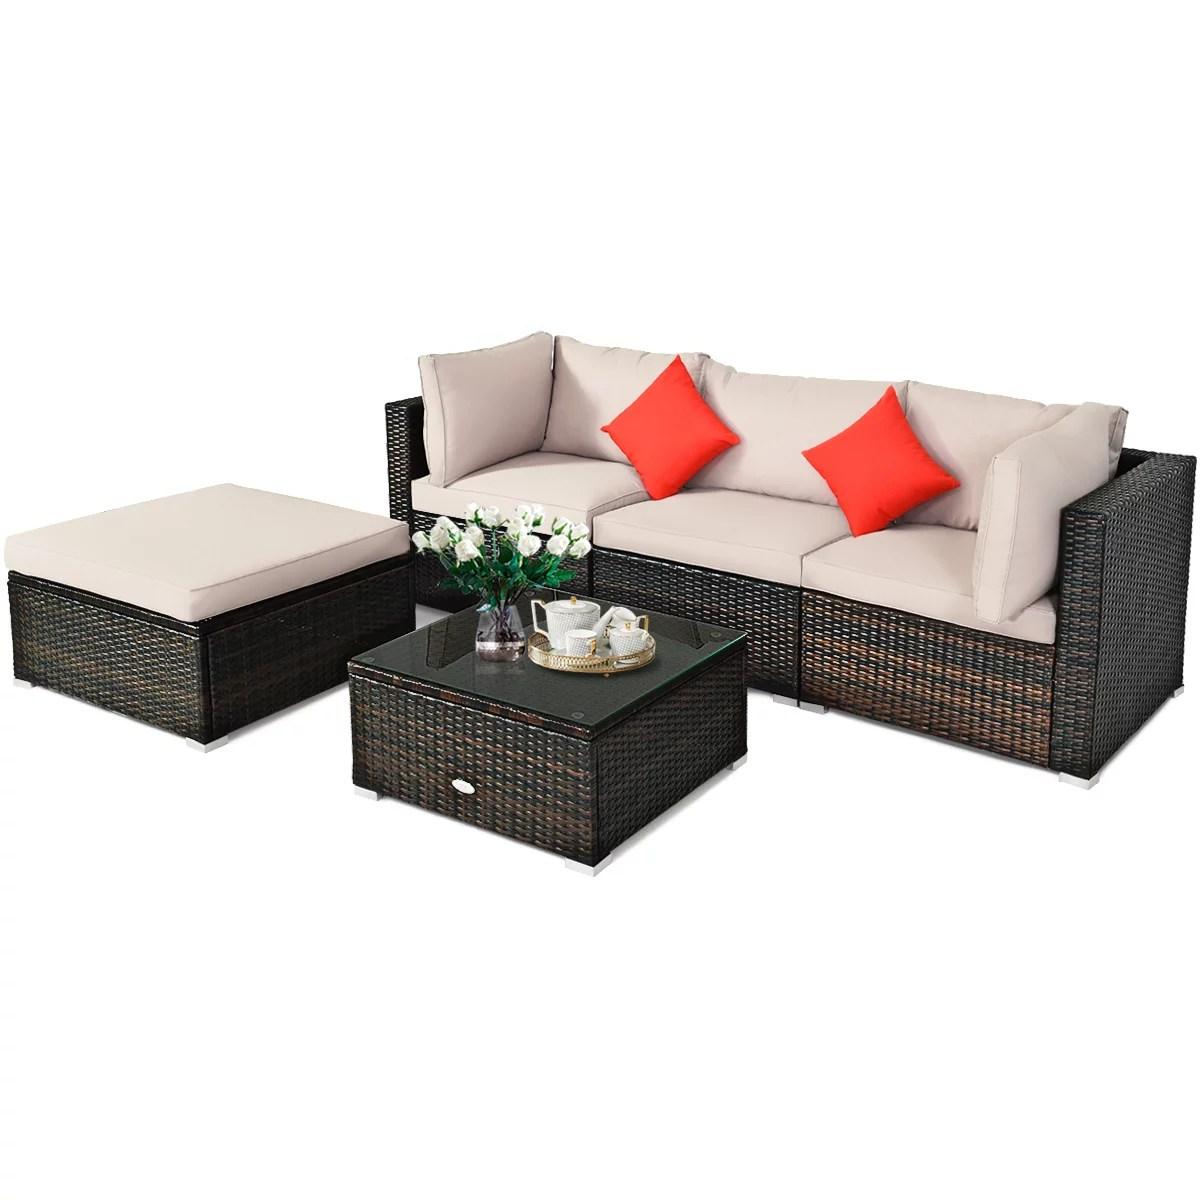 patiojoy 5 piece outdoor patio sectional rattan wicker sofa set w cushion